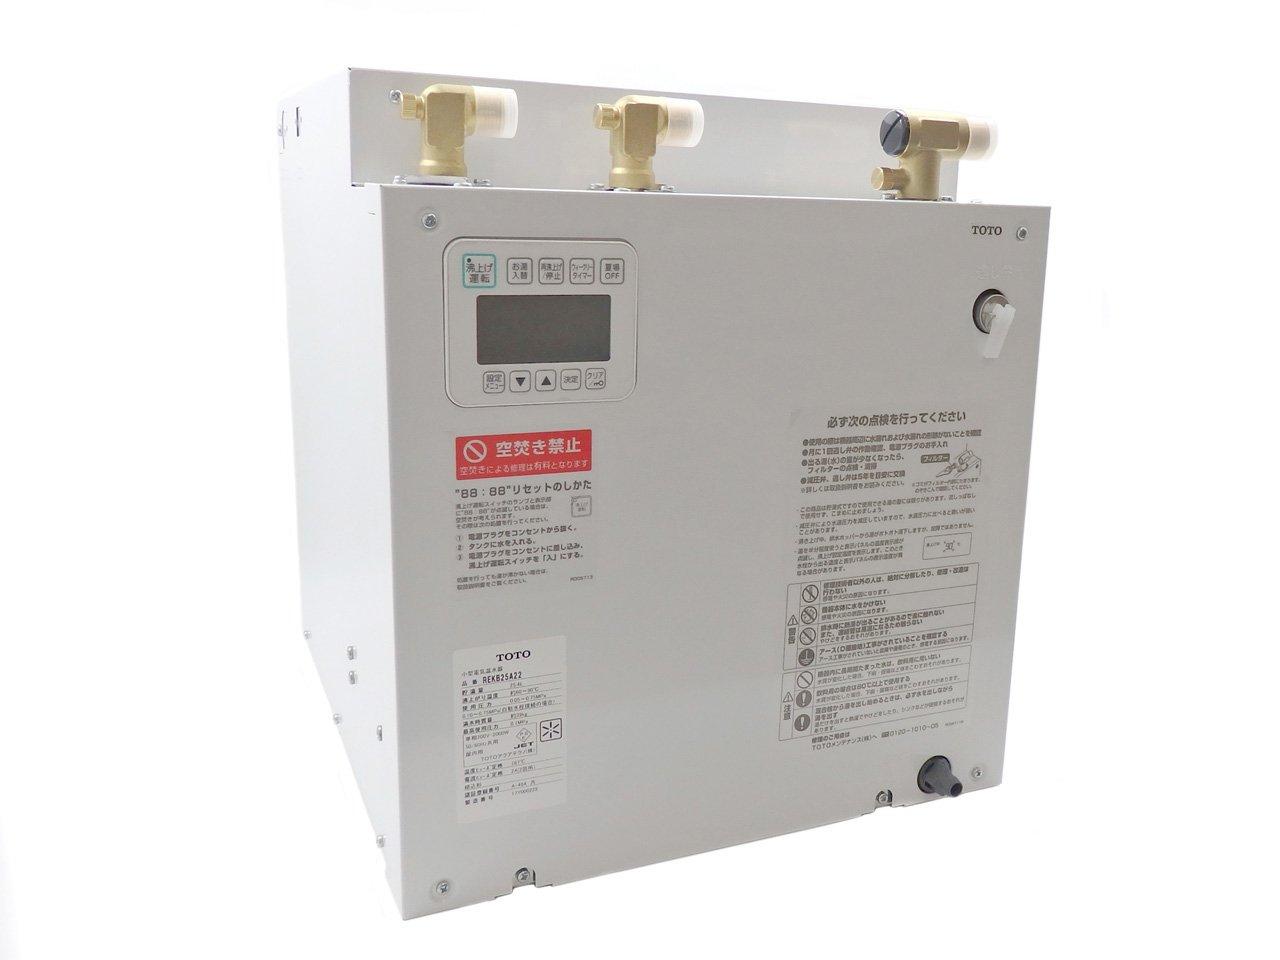 TOTO 小型電気温水器 REKB25A22 B07BT7VW4X